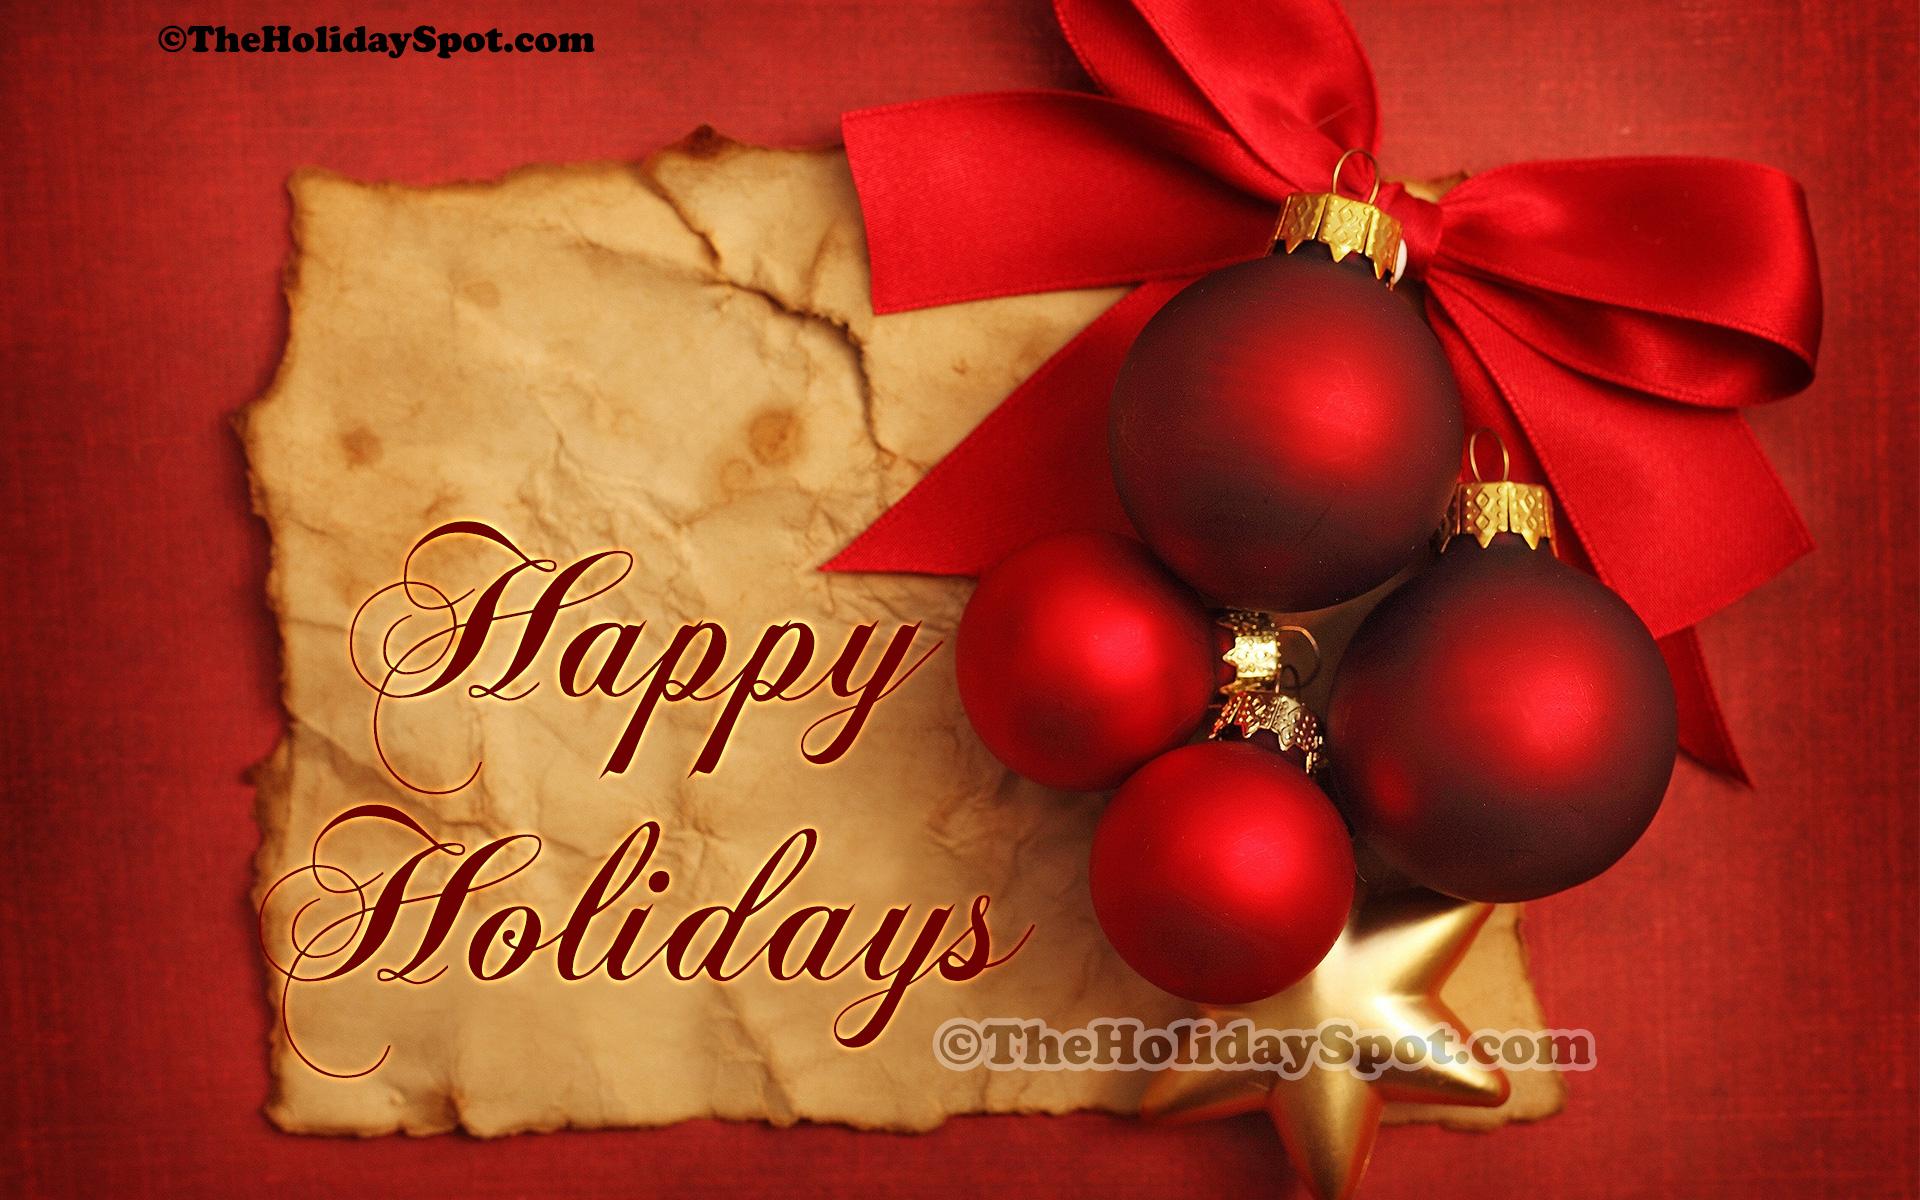 Happy-Holidays-Holiday-Images-HD-of-Greeting-1920×1080-Happy-Holidays-Wall-wallpaper-wp3606545